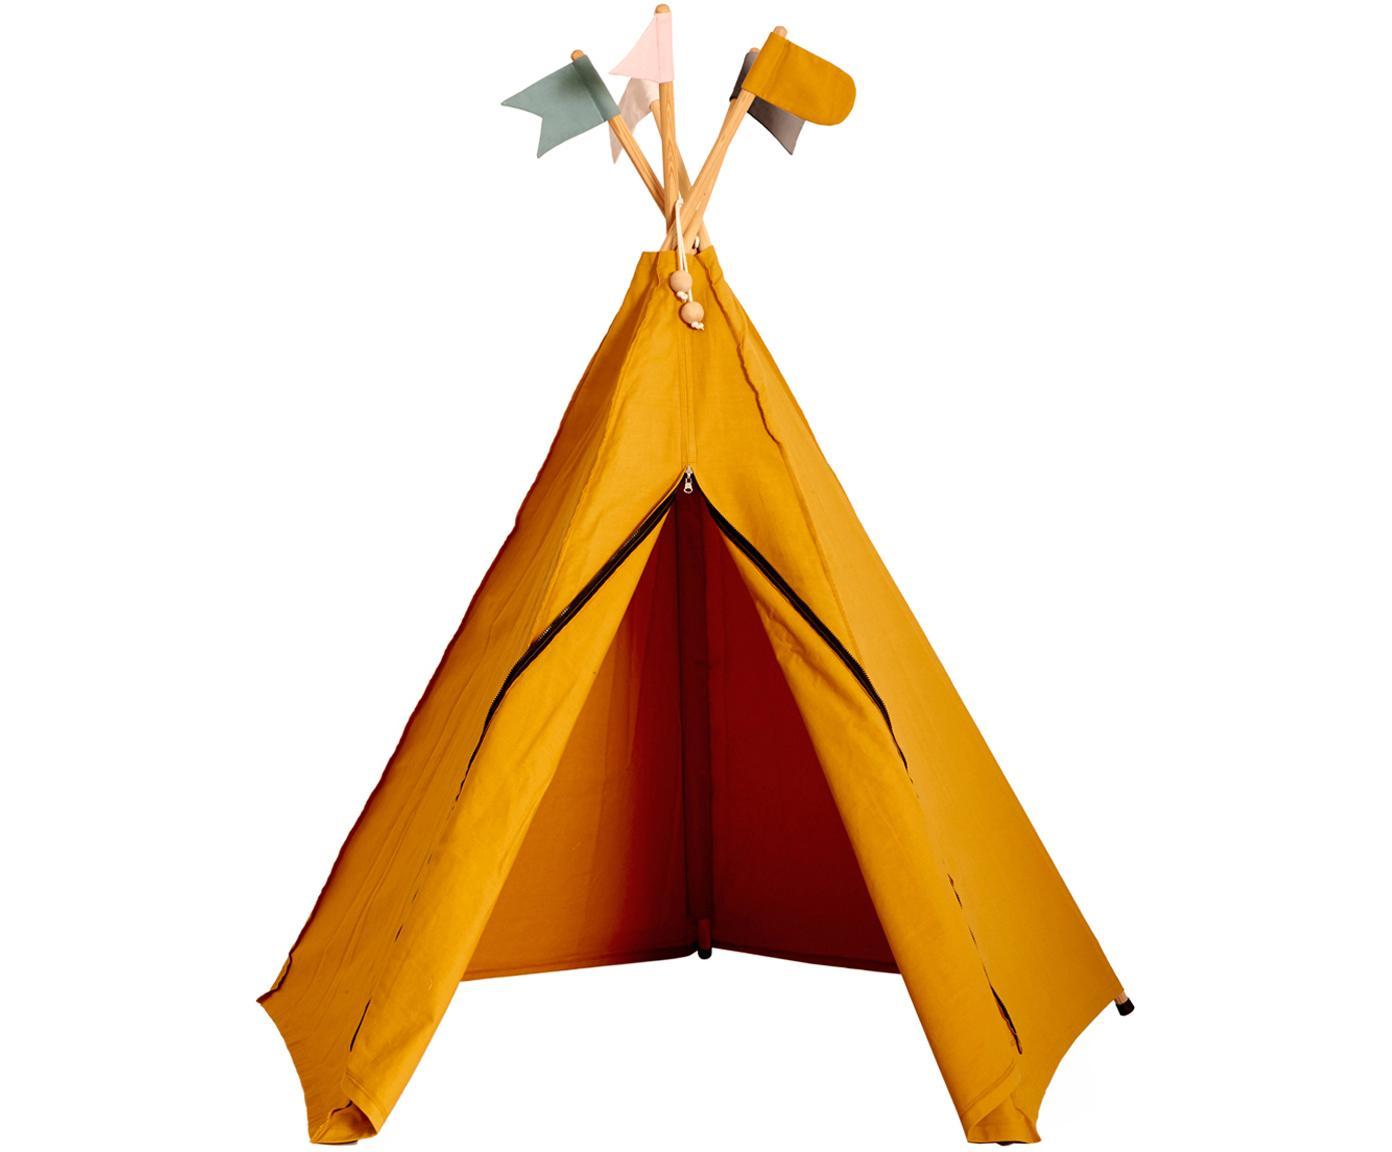 Tenda indiana teepee in cotone organico Hippie, Cotone organico, certificato GOTS, Giallo ocra, Larg. 135 x Alt. 135 cm